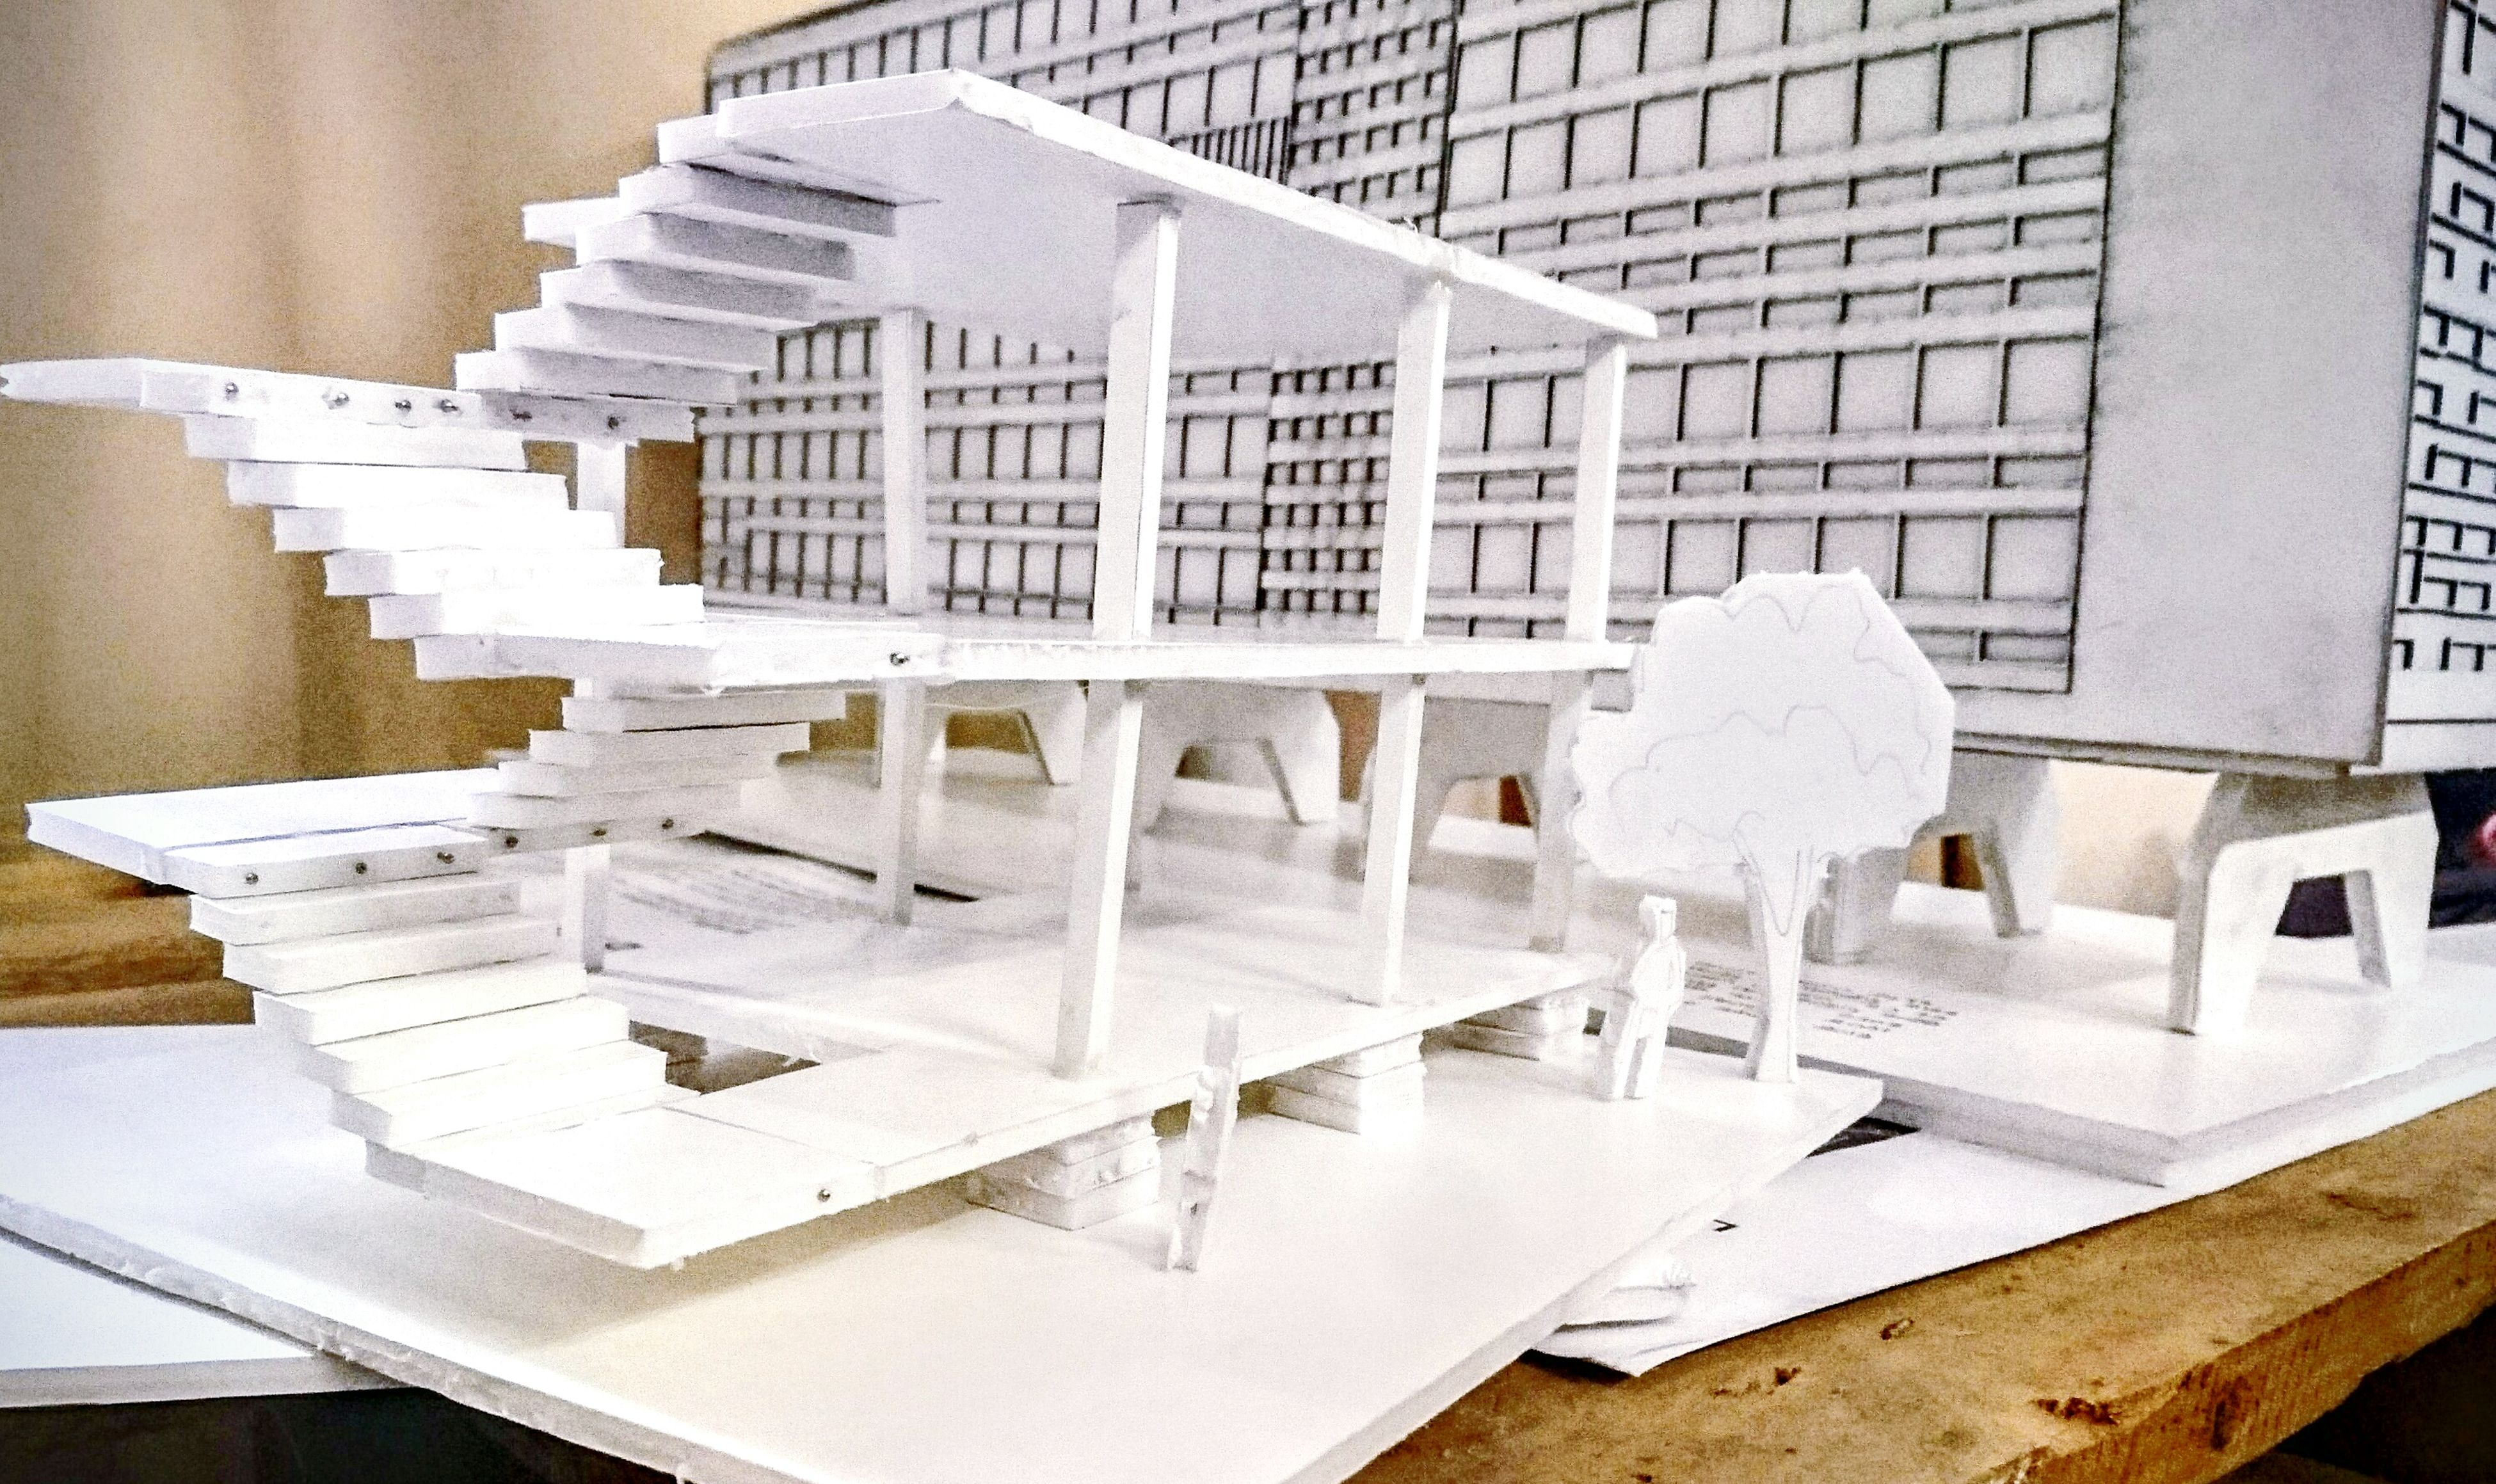 Architecture Building Exterior All White Micheal Graves Dom-ino Maquette Modern Architecture Students Work